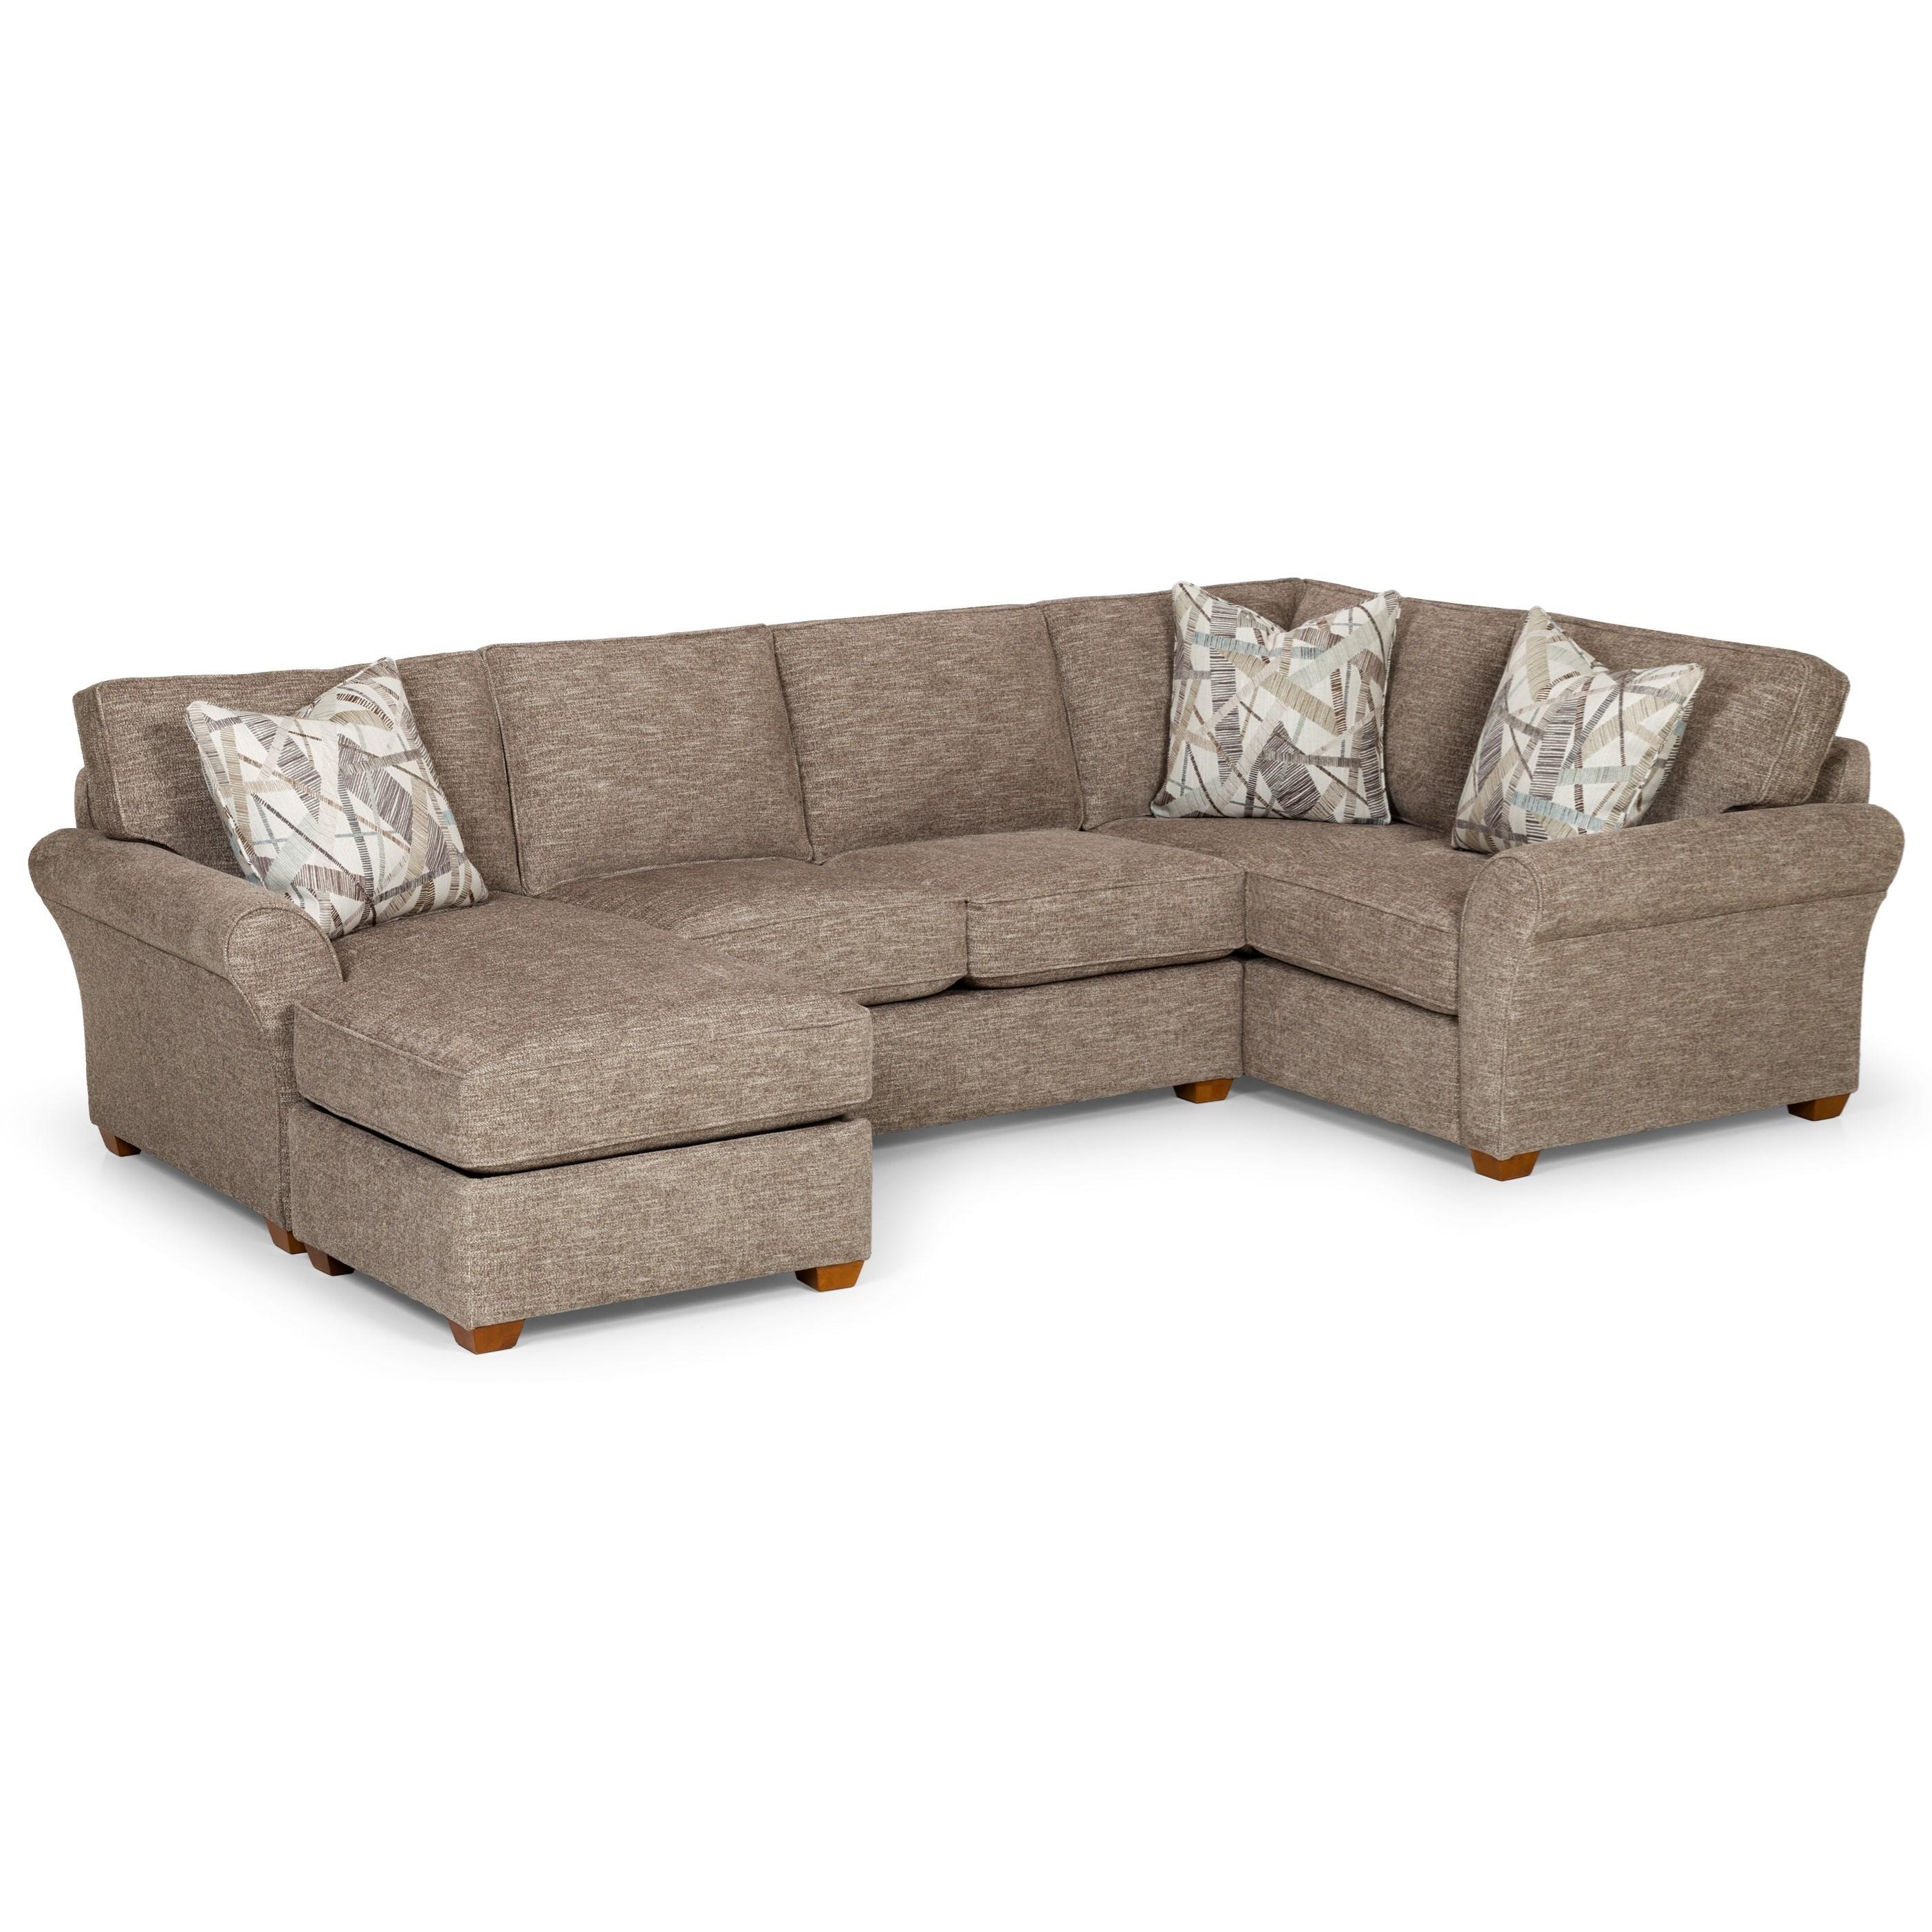 2 Pc Sectional Sofa